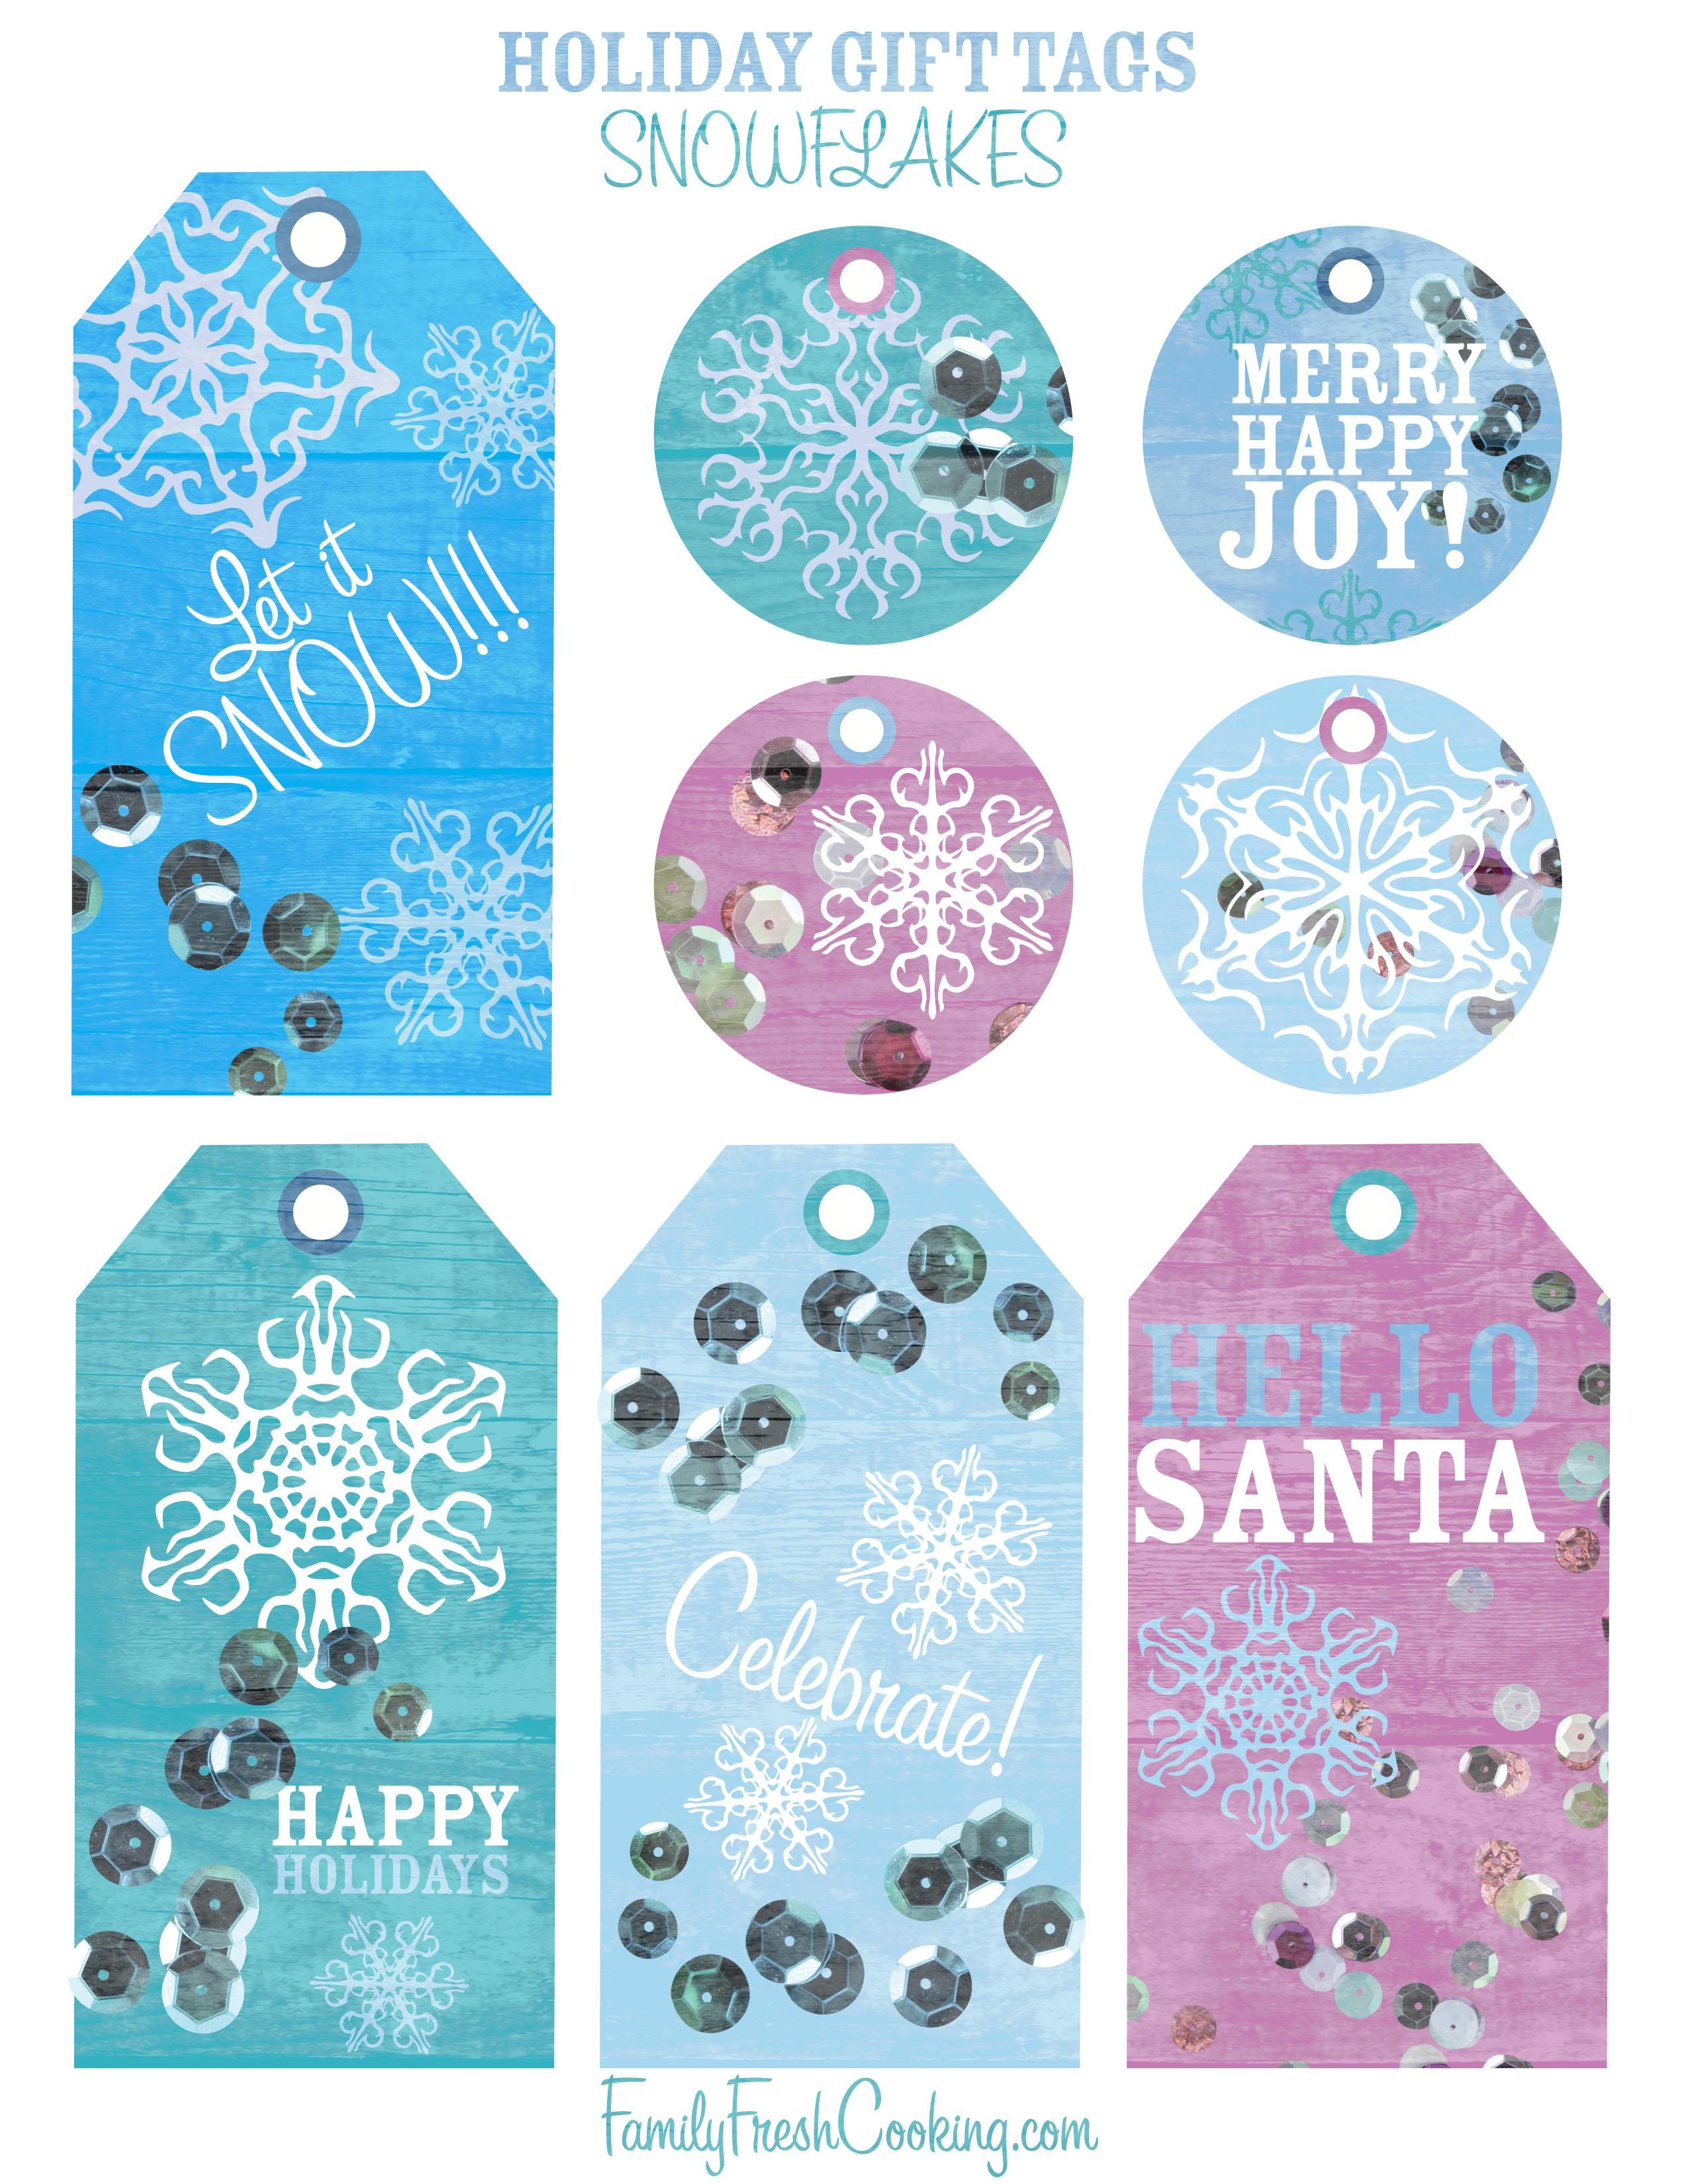 Snowflakes ~ Free Printable Holiday Gift Tags - Marla Meridith - Free Printable Happy Holidays Gift Tags